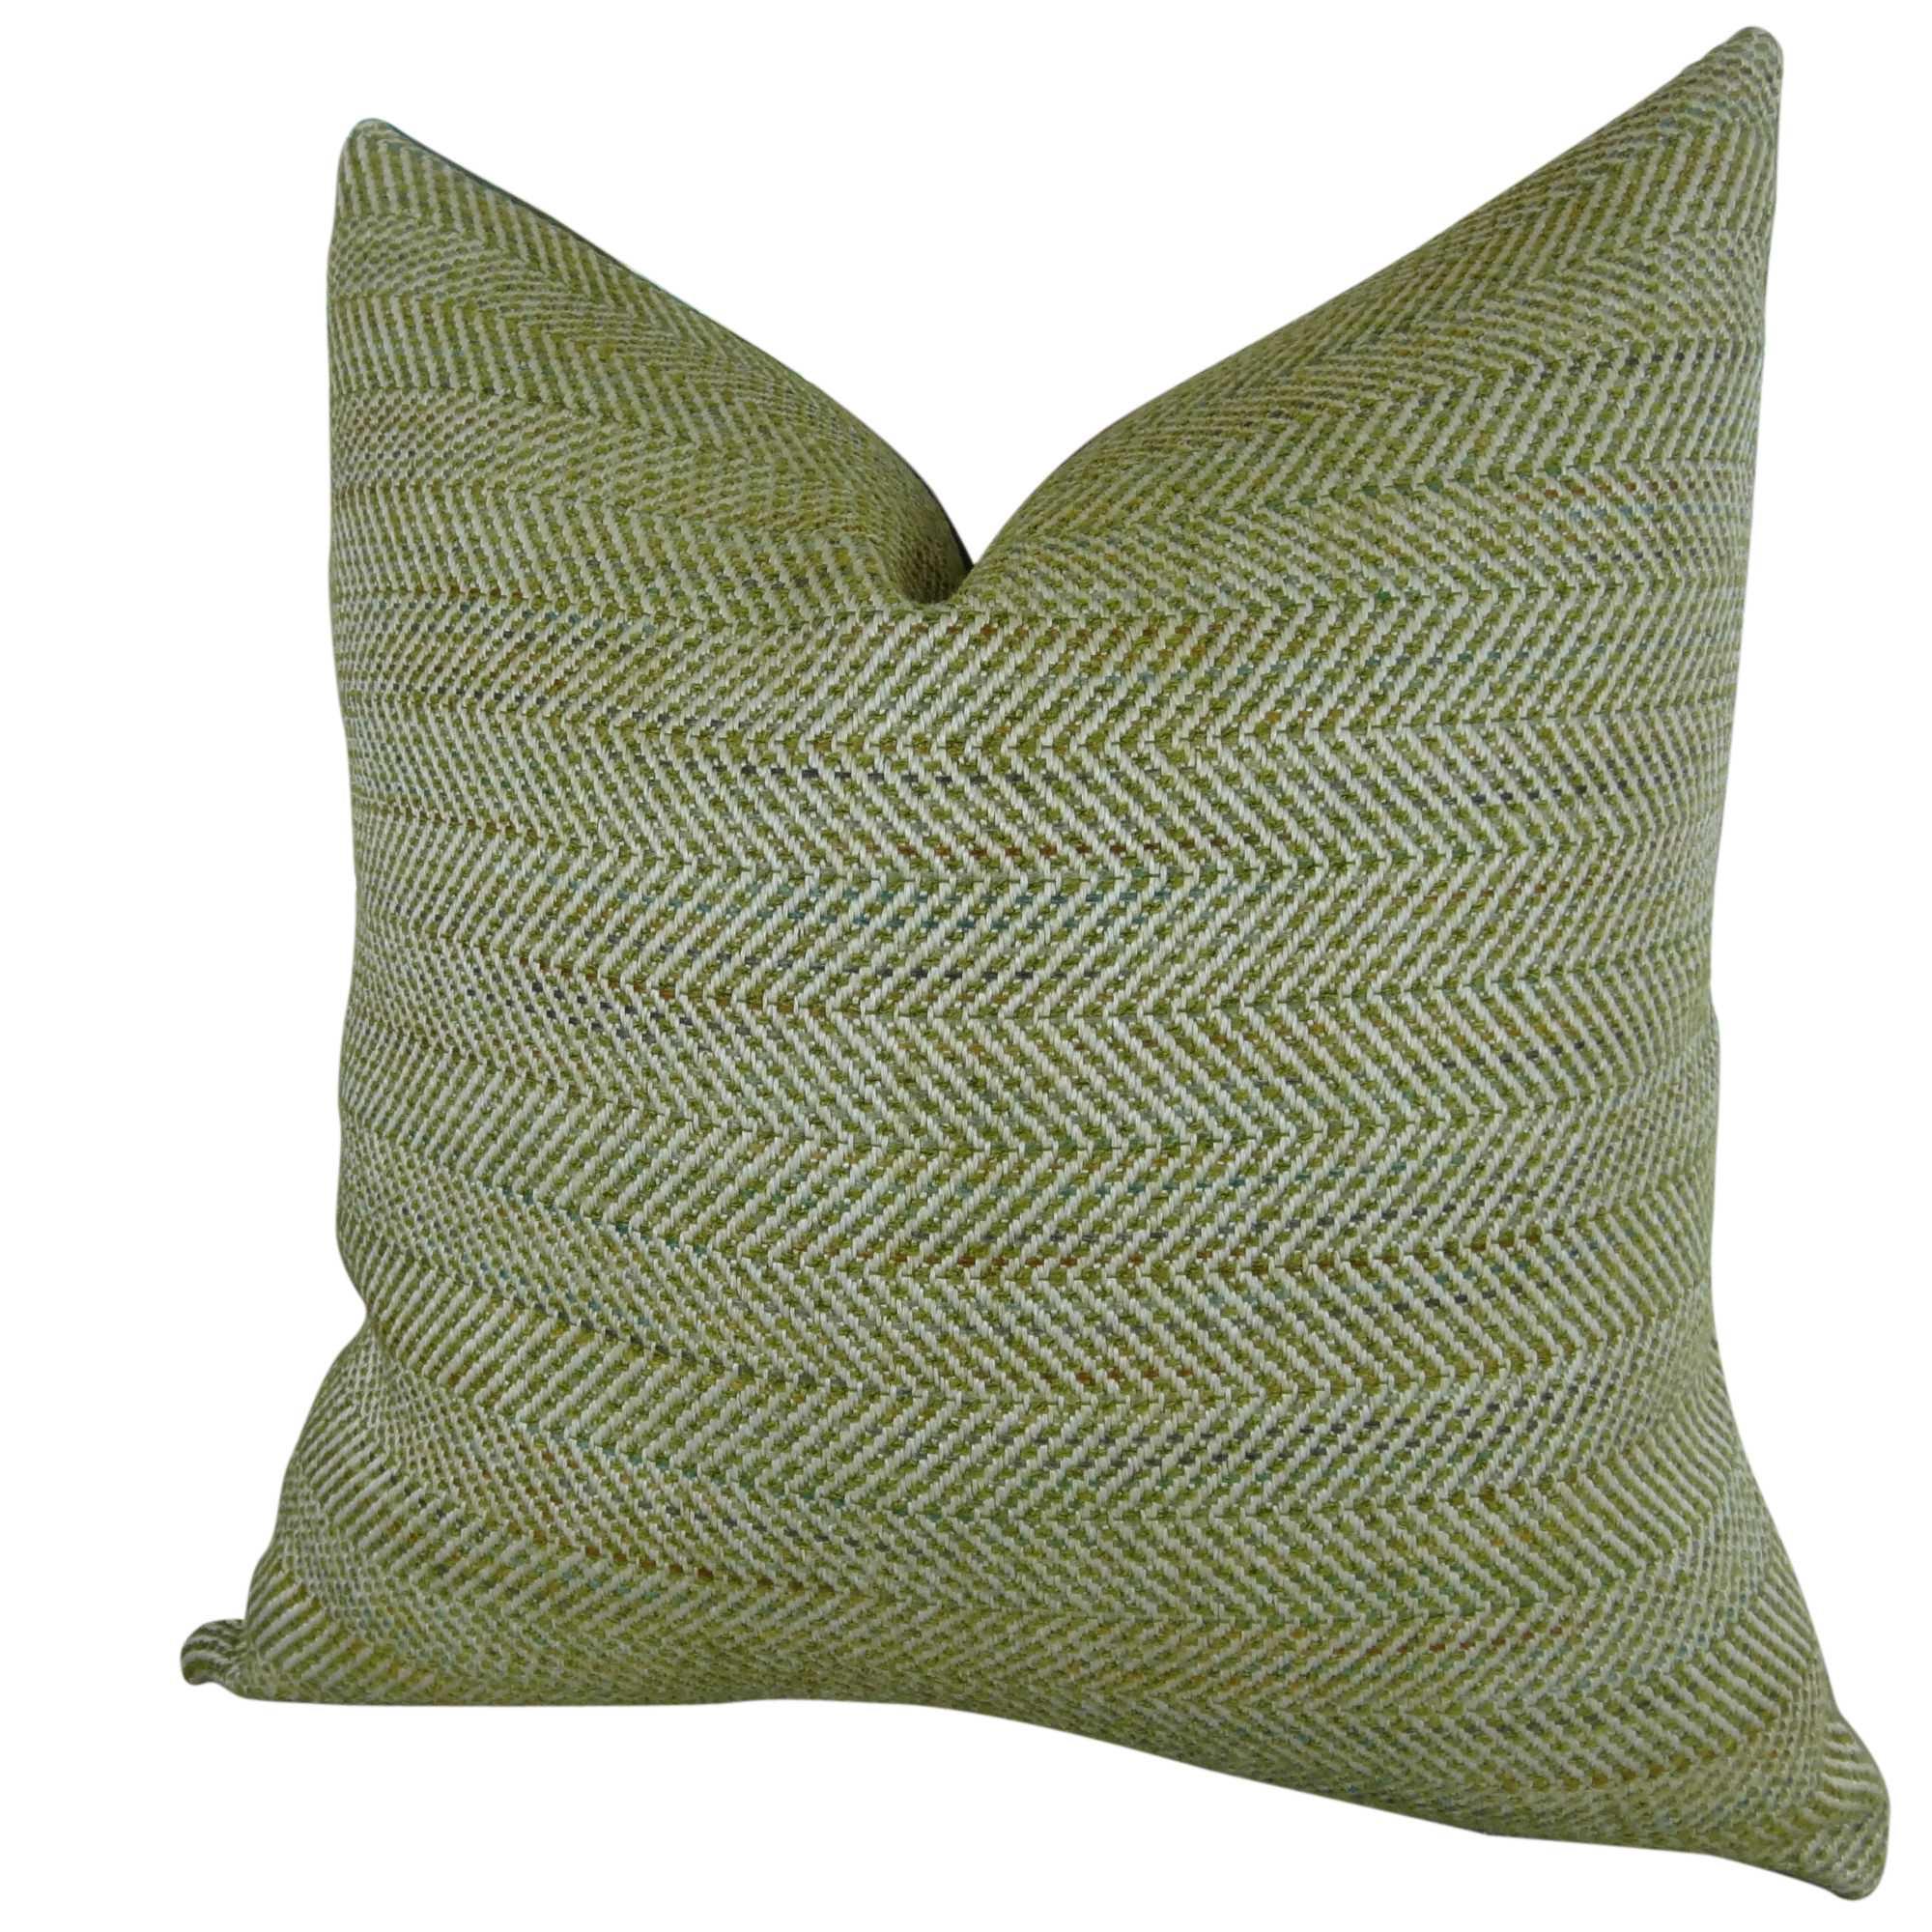 Parsburg Handmade Throw Pillow